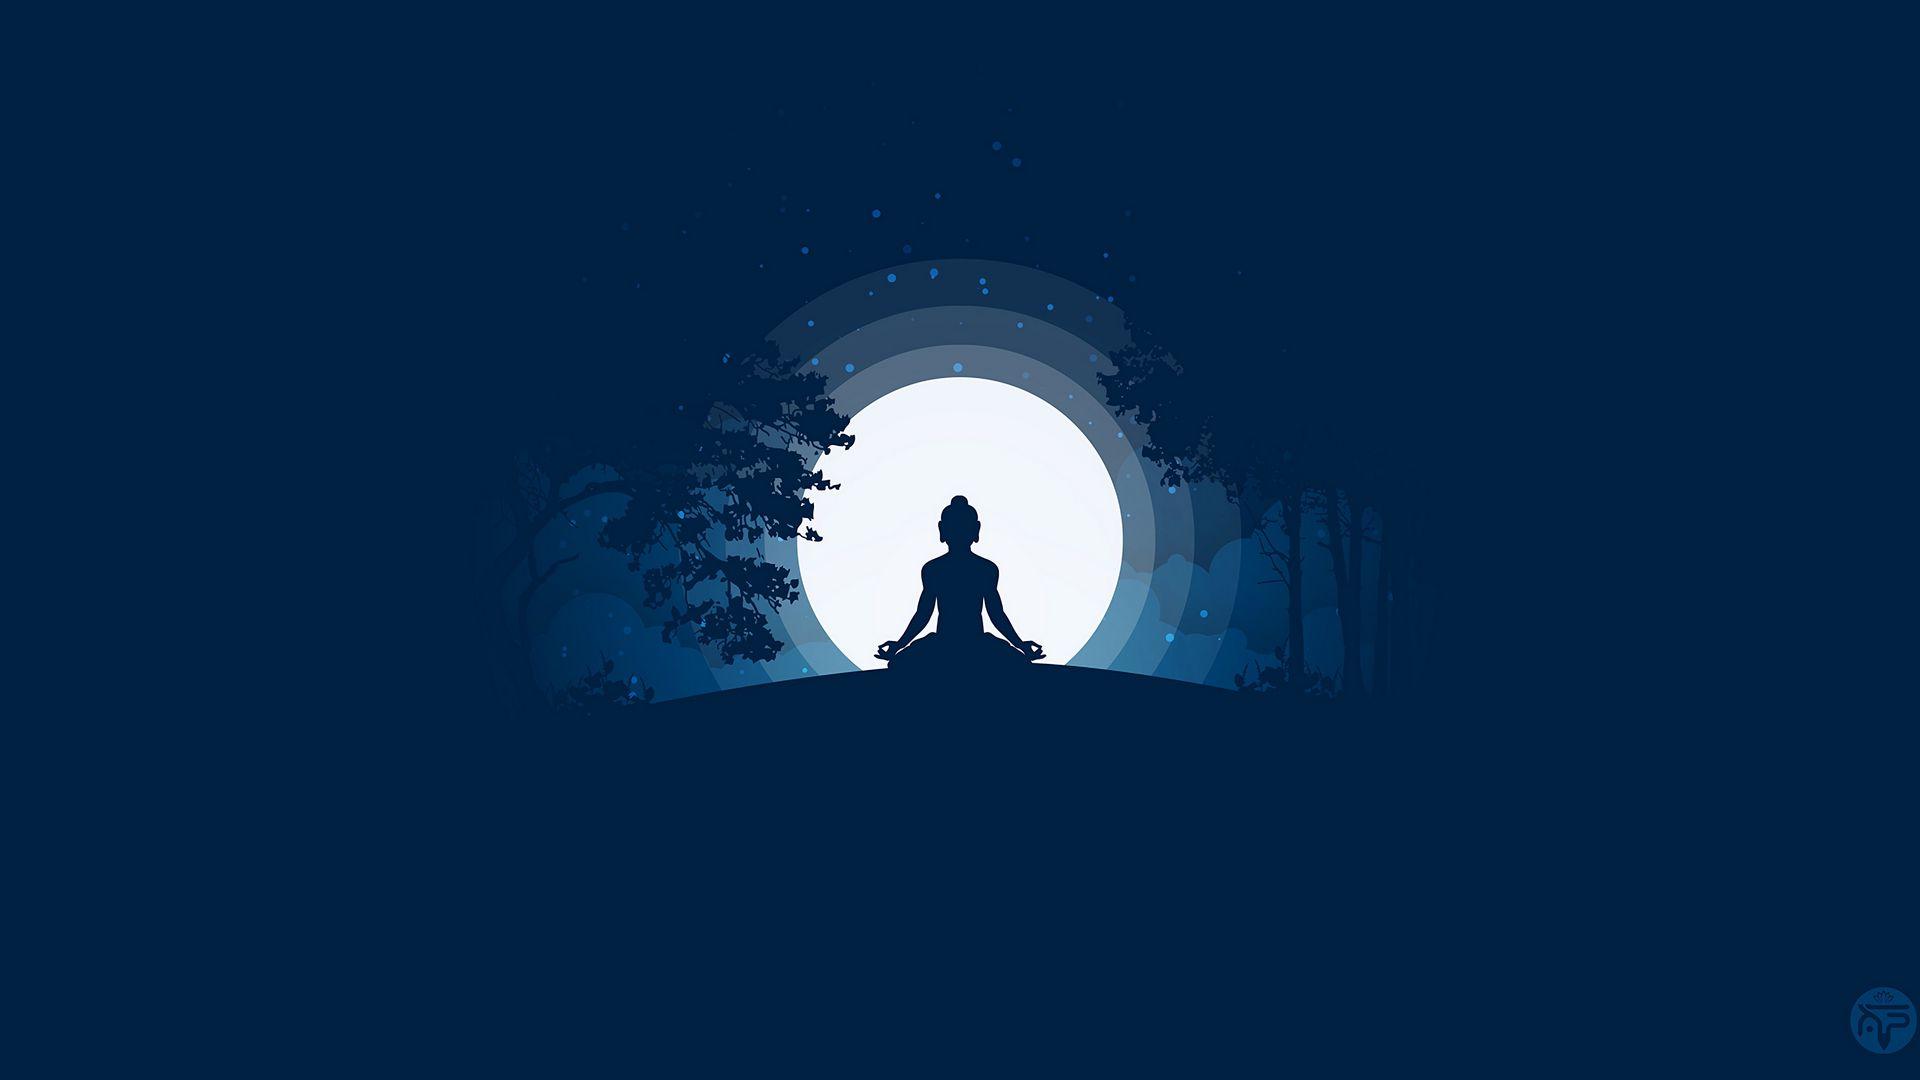 1920x1080 Wallpaper buddha, buddhism, meditation, harmony, silhouette